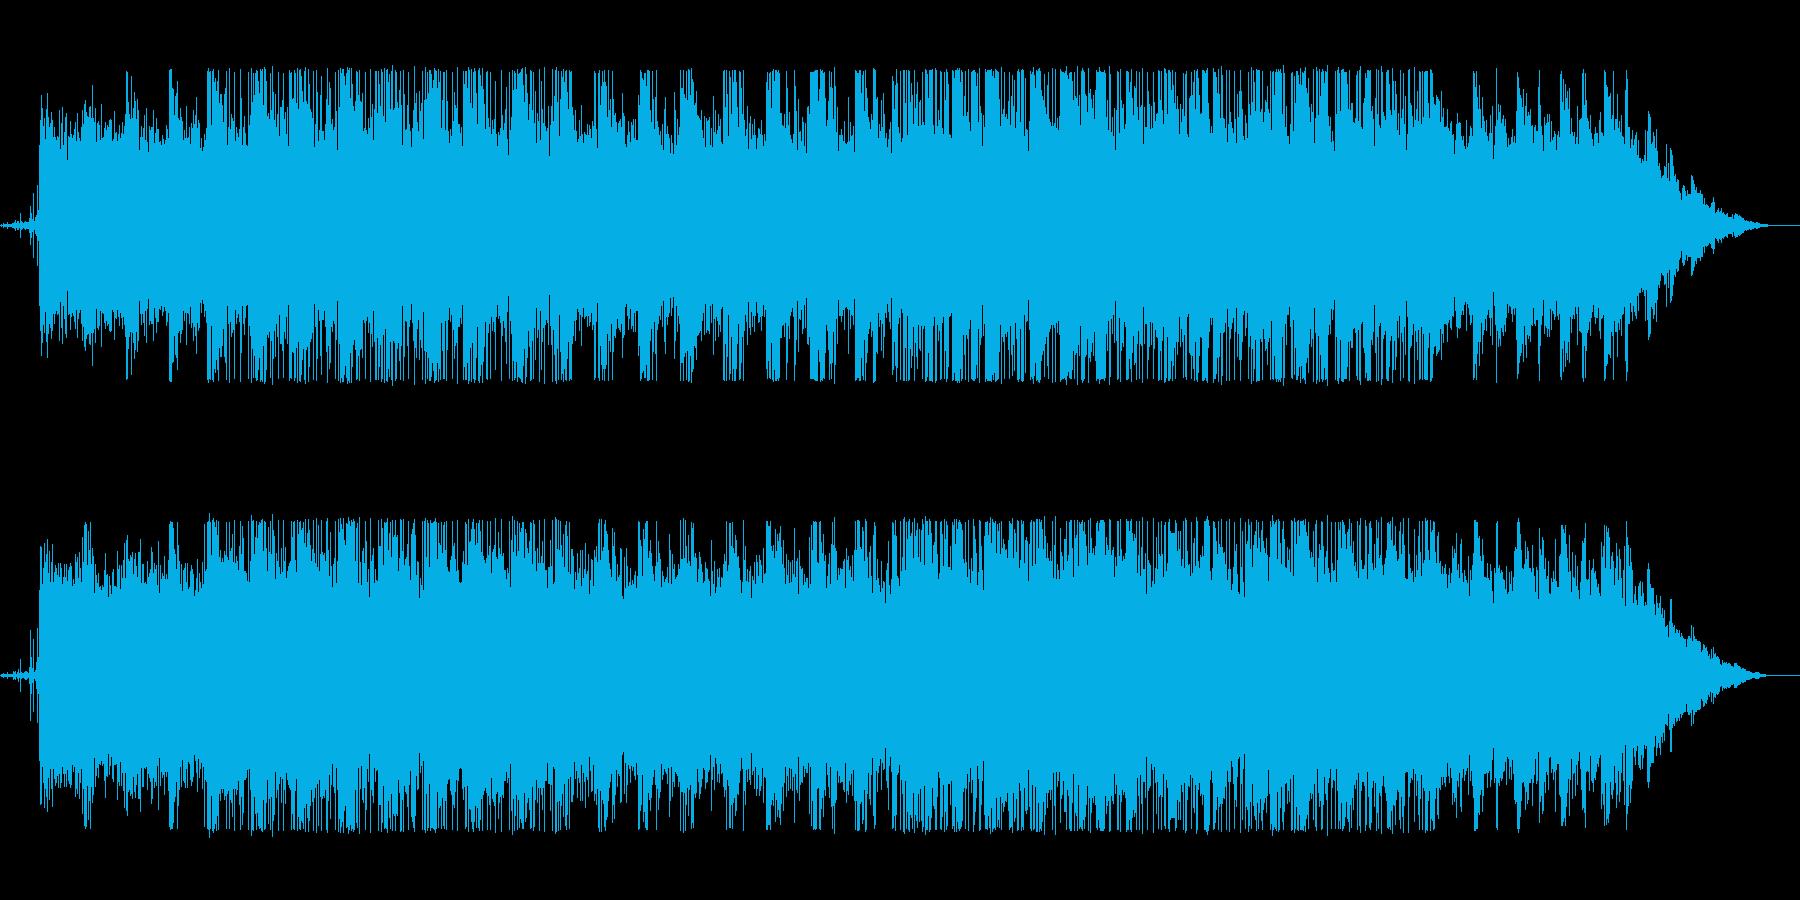 Chill/Healing系シリーズ曲4の再生済みの波形